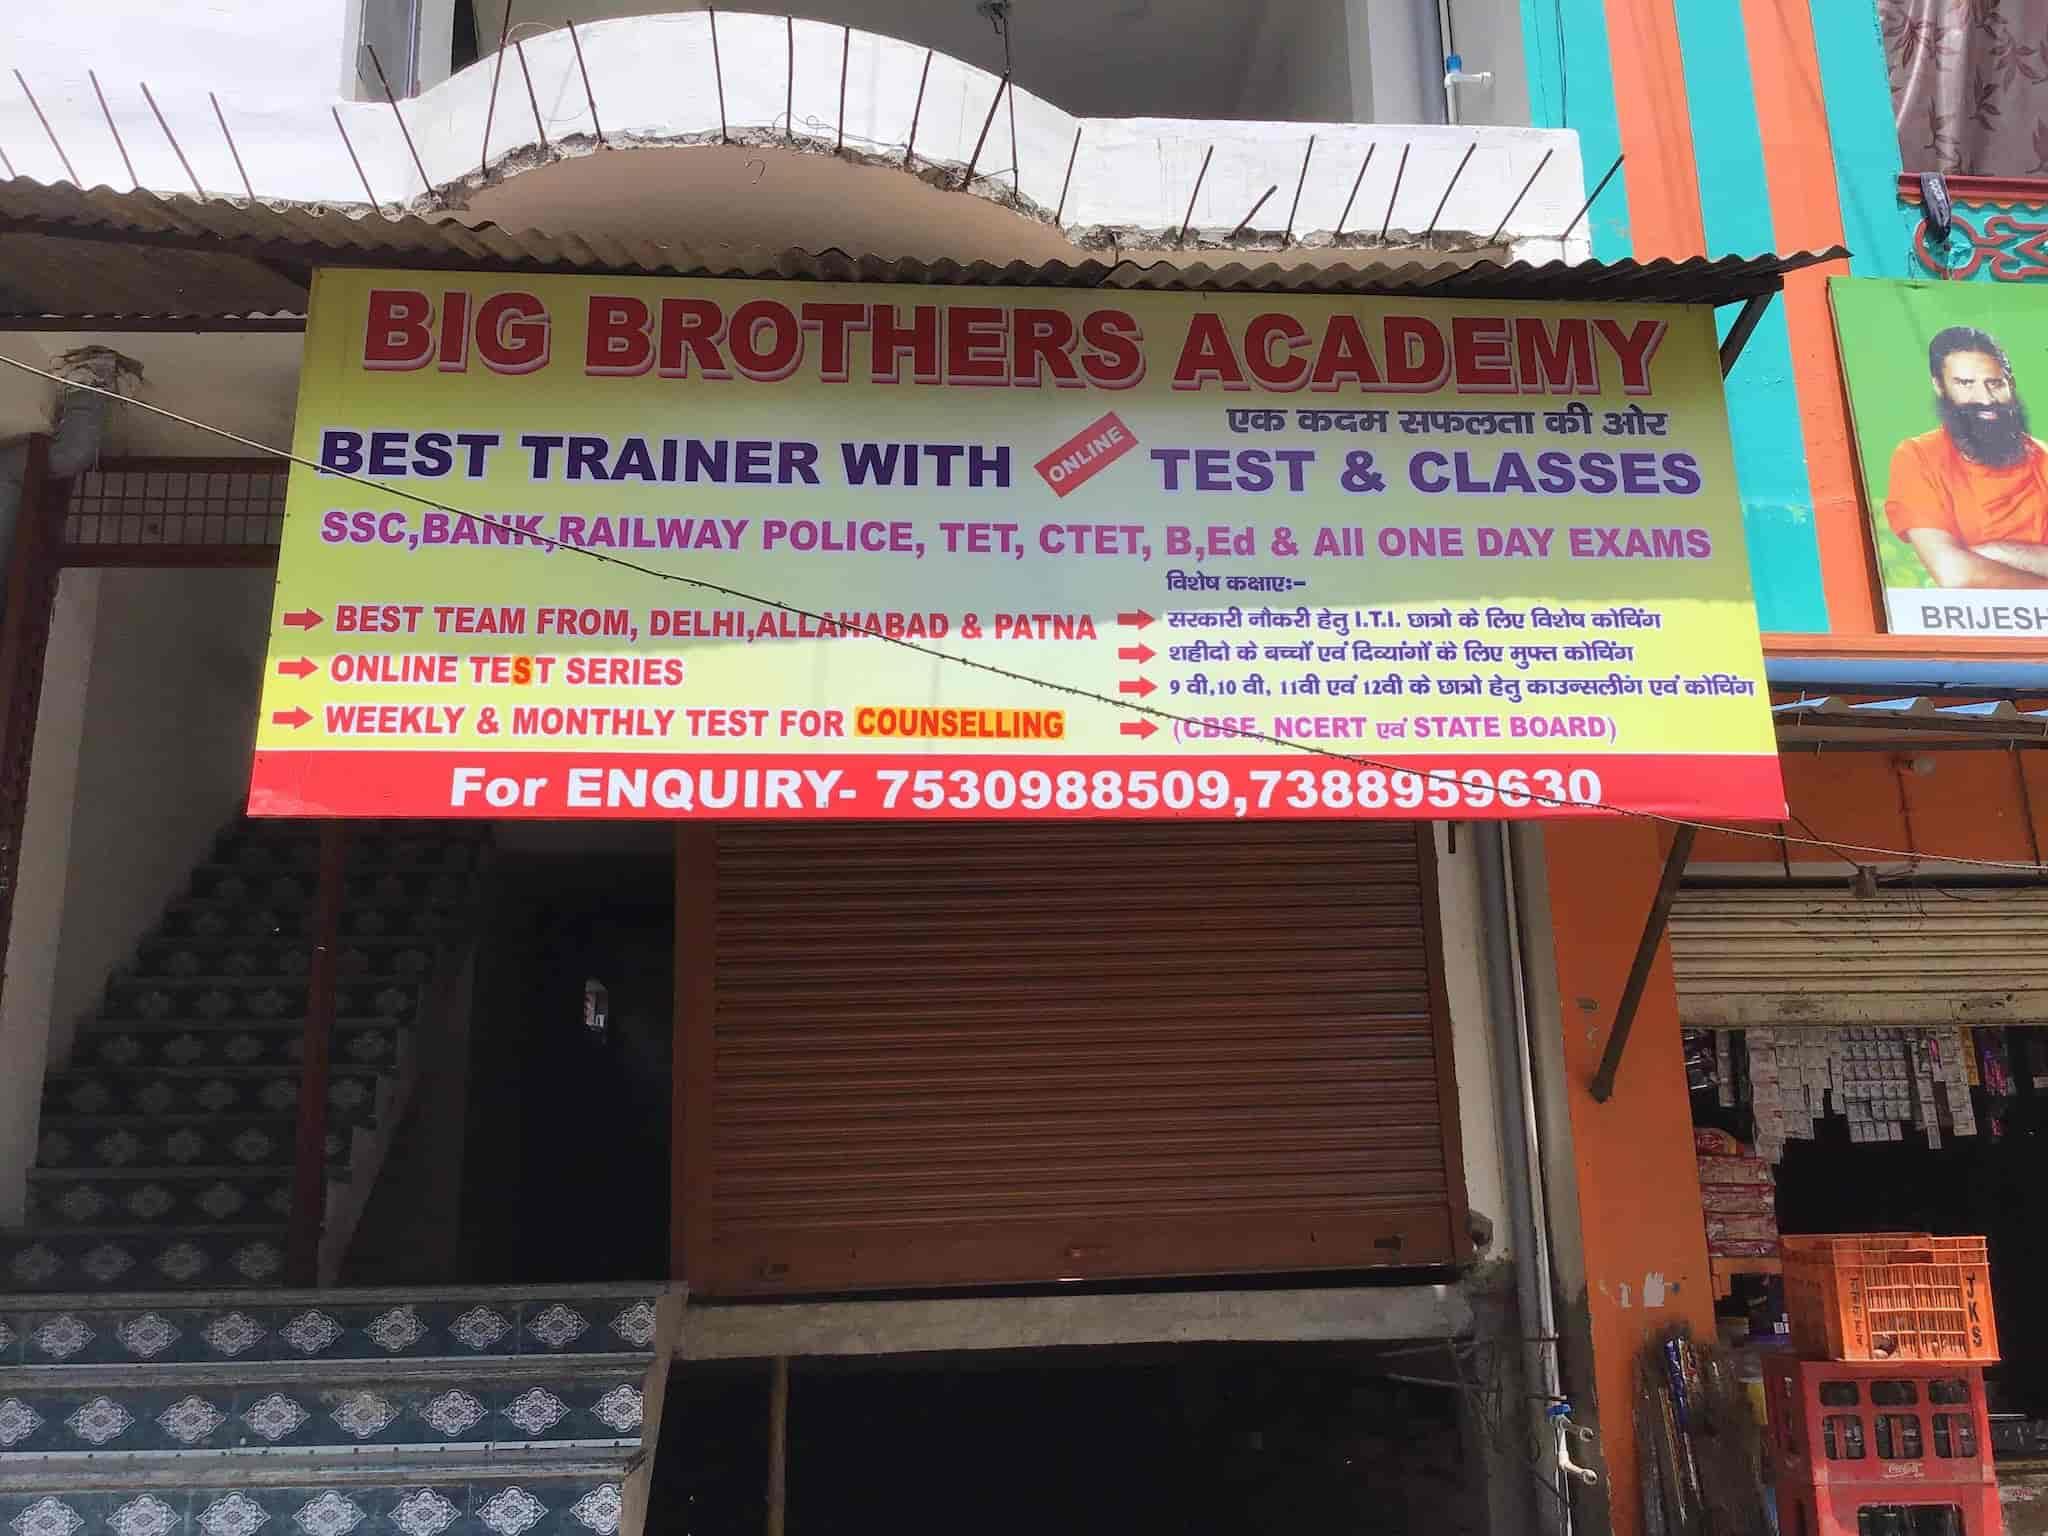 Big Brothers Academy, Mirzapur City - Tutorials in Mirzapur - Justdial